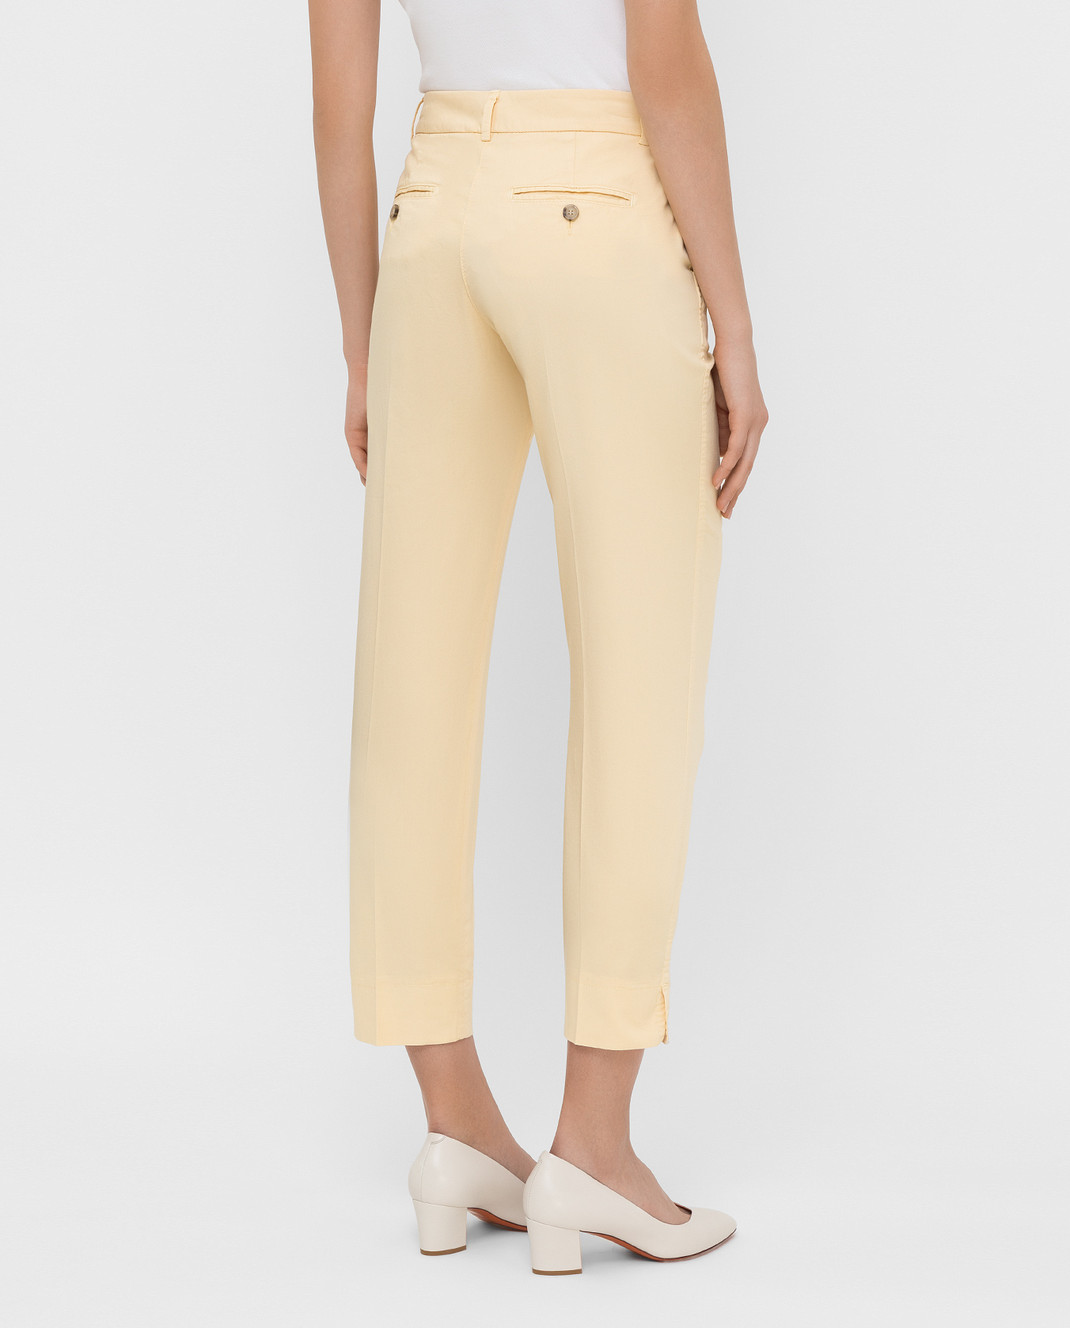 Peserico Светло-желтые брюки P04718T402477 изображение 4